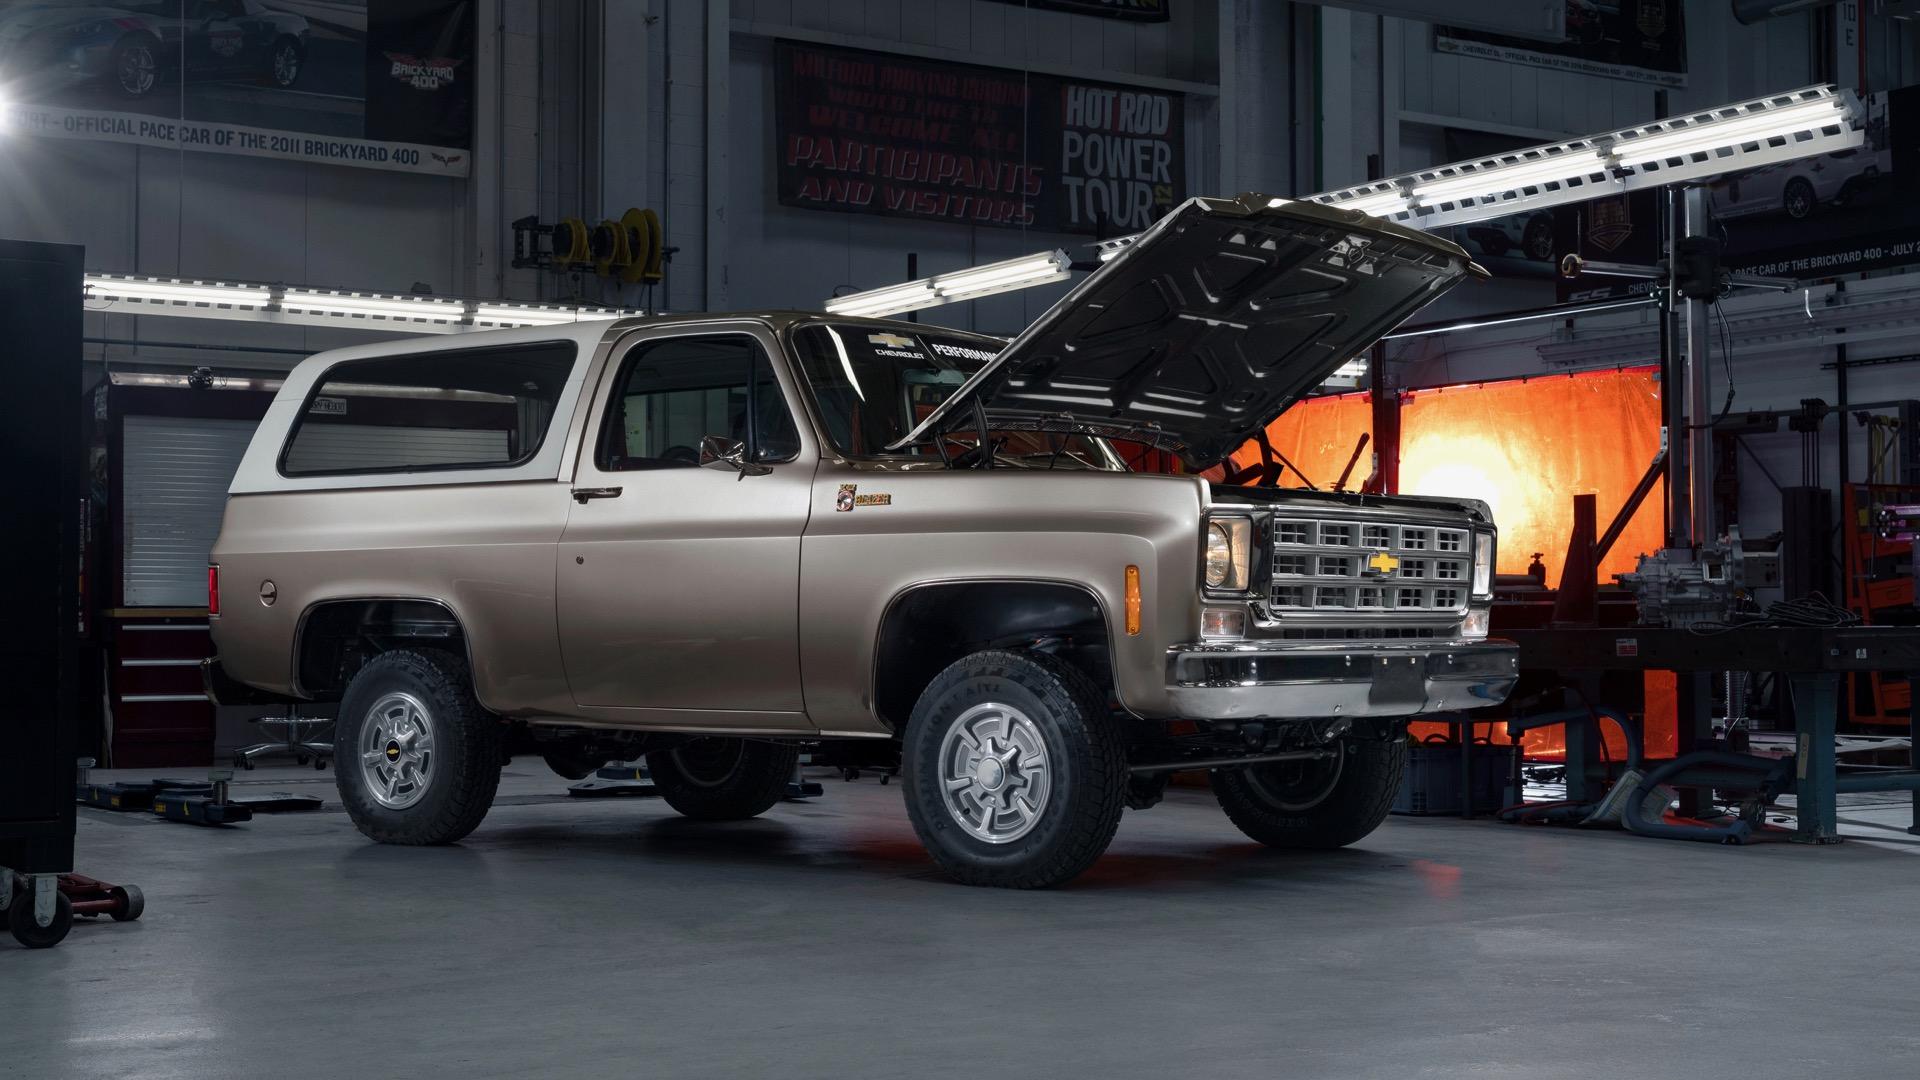 Kelebihan Kekurangan Chevrolet K5 Murah Berkualitas